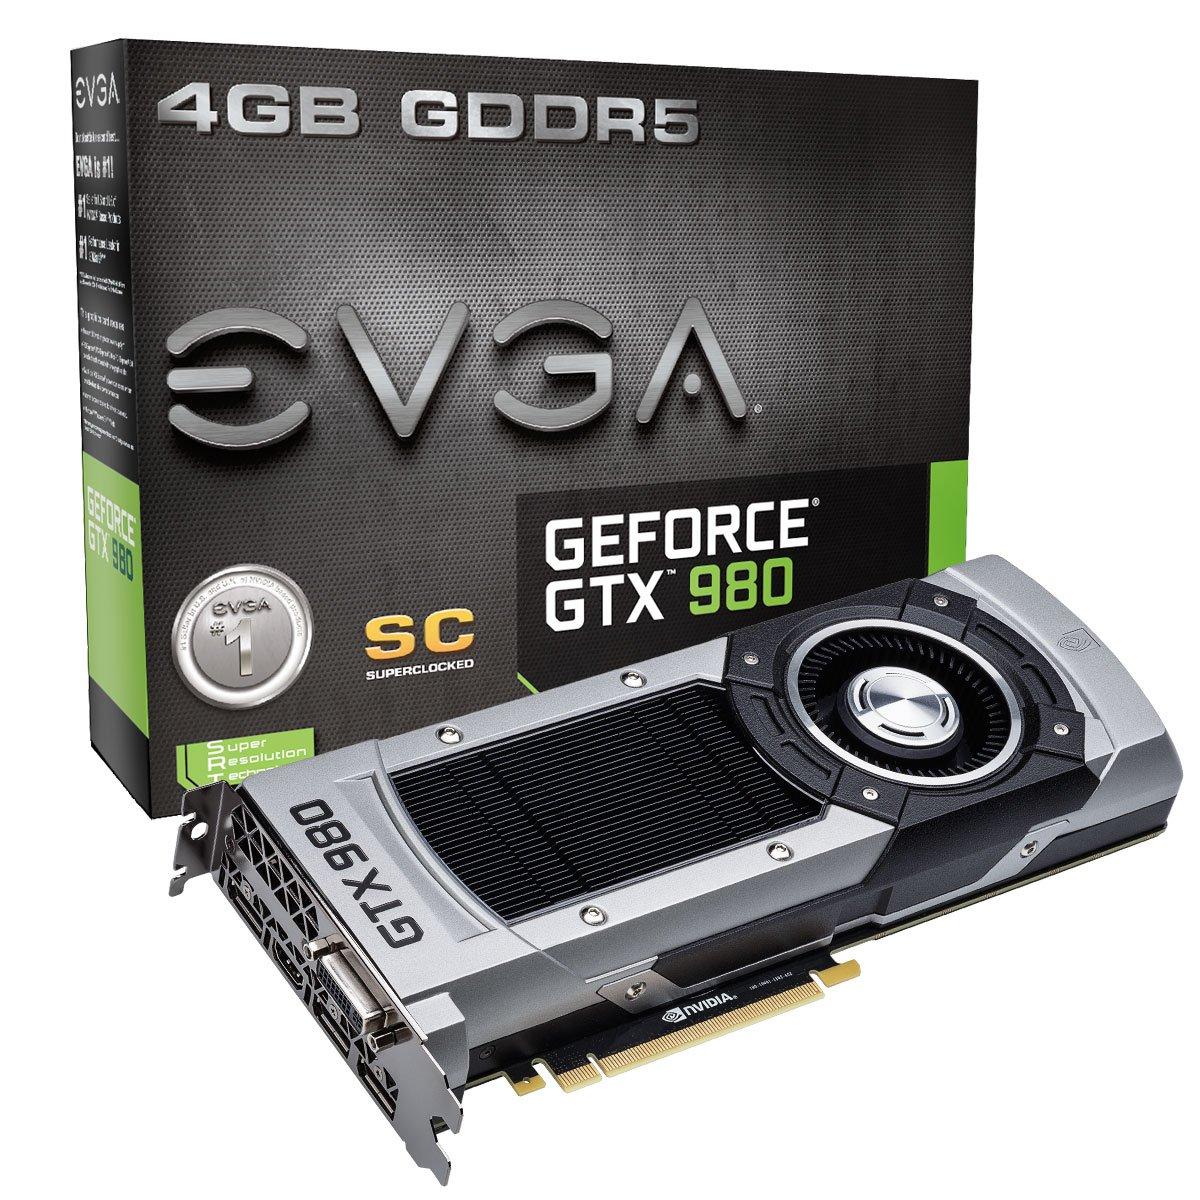 EVGA GTX980 Superclocked 4GB GDDR5 256bit, DVI-I, DP x 3, HDMI, SLI Ready Graphics Card (04G-P4-2982-KR)